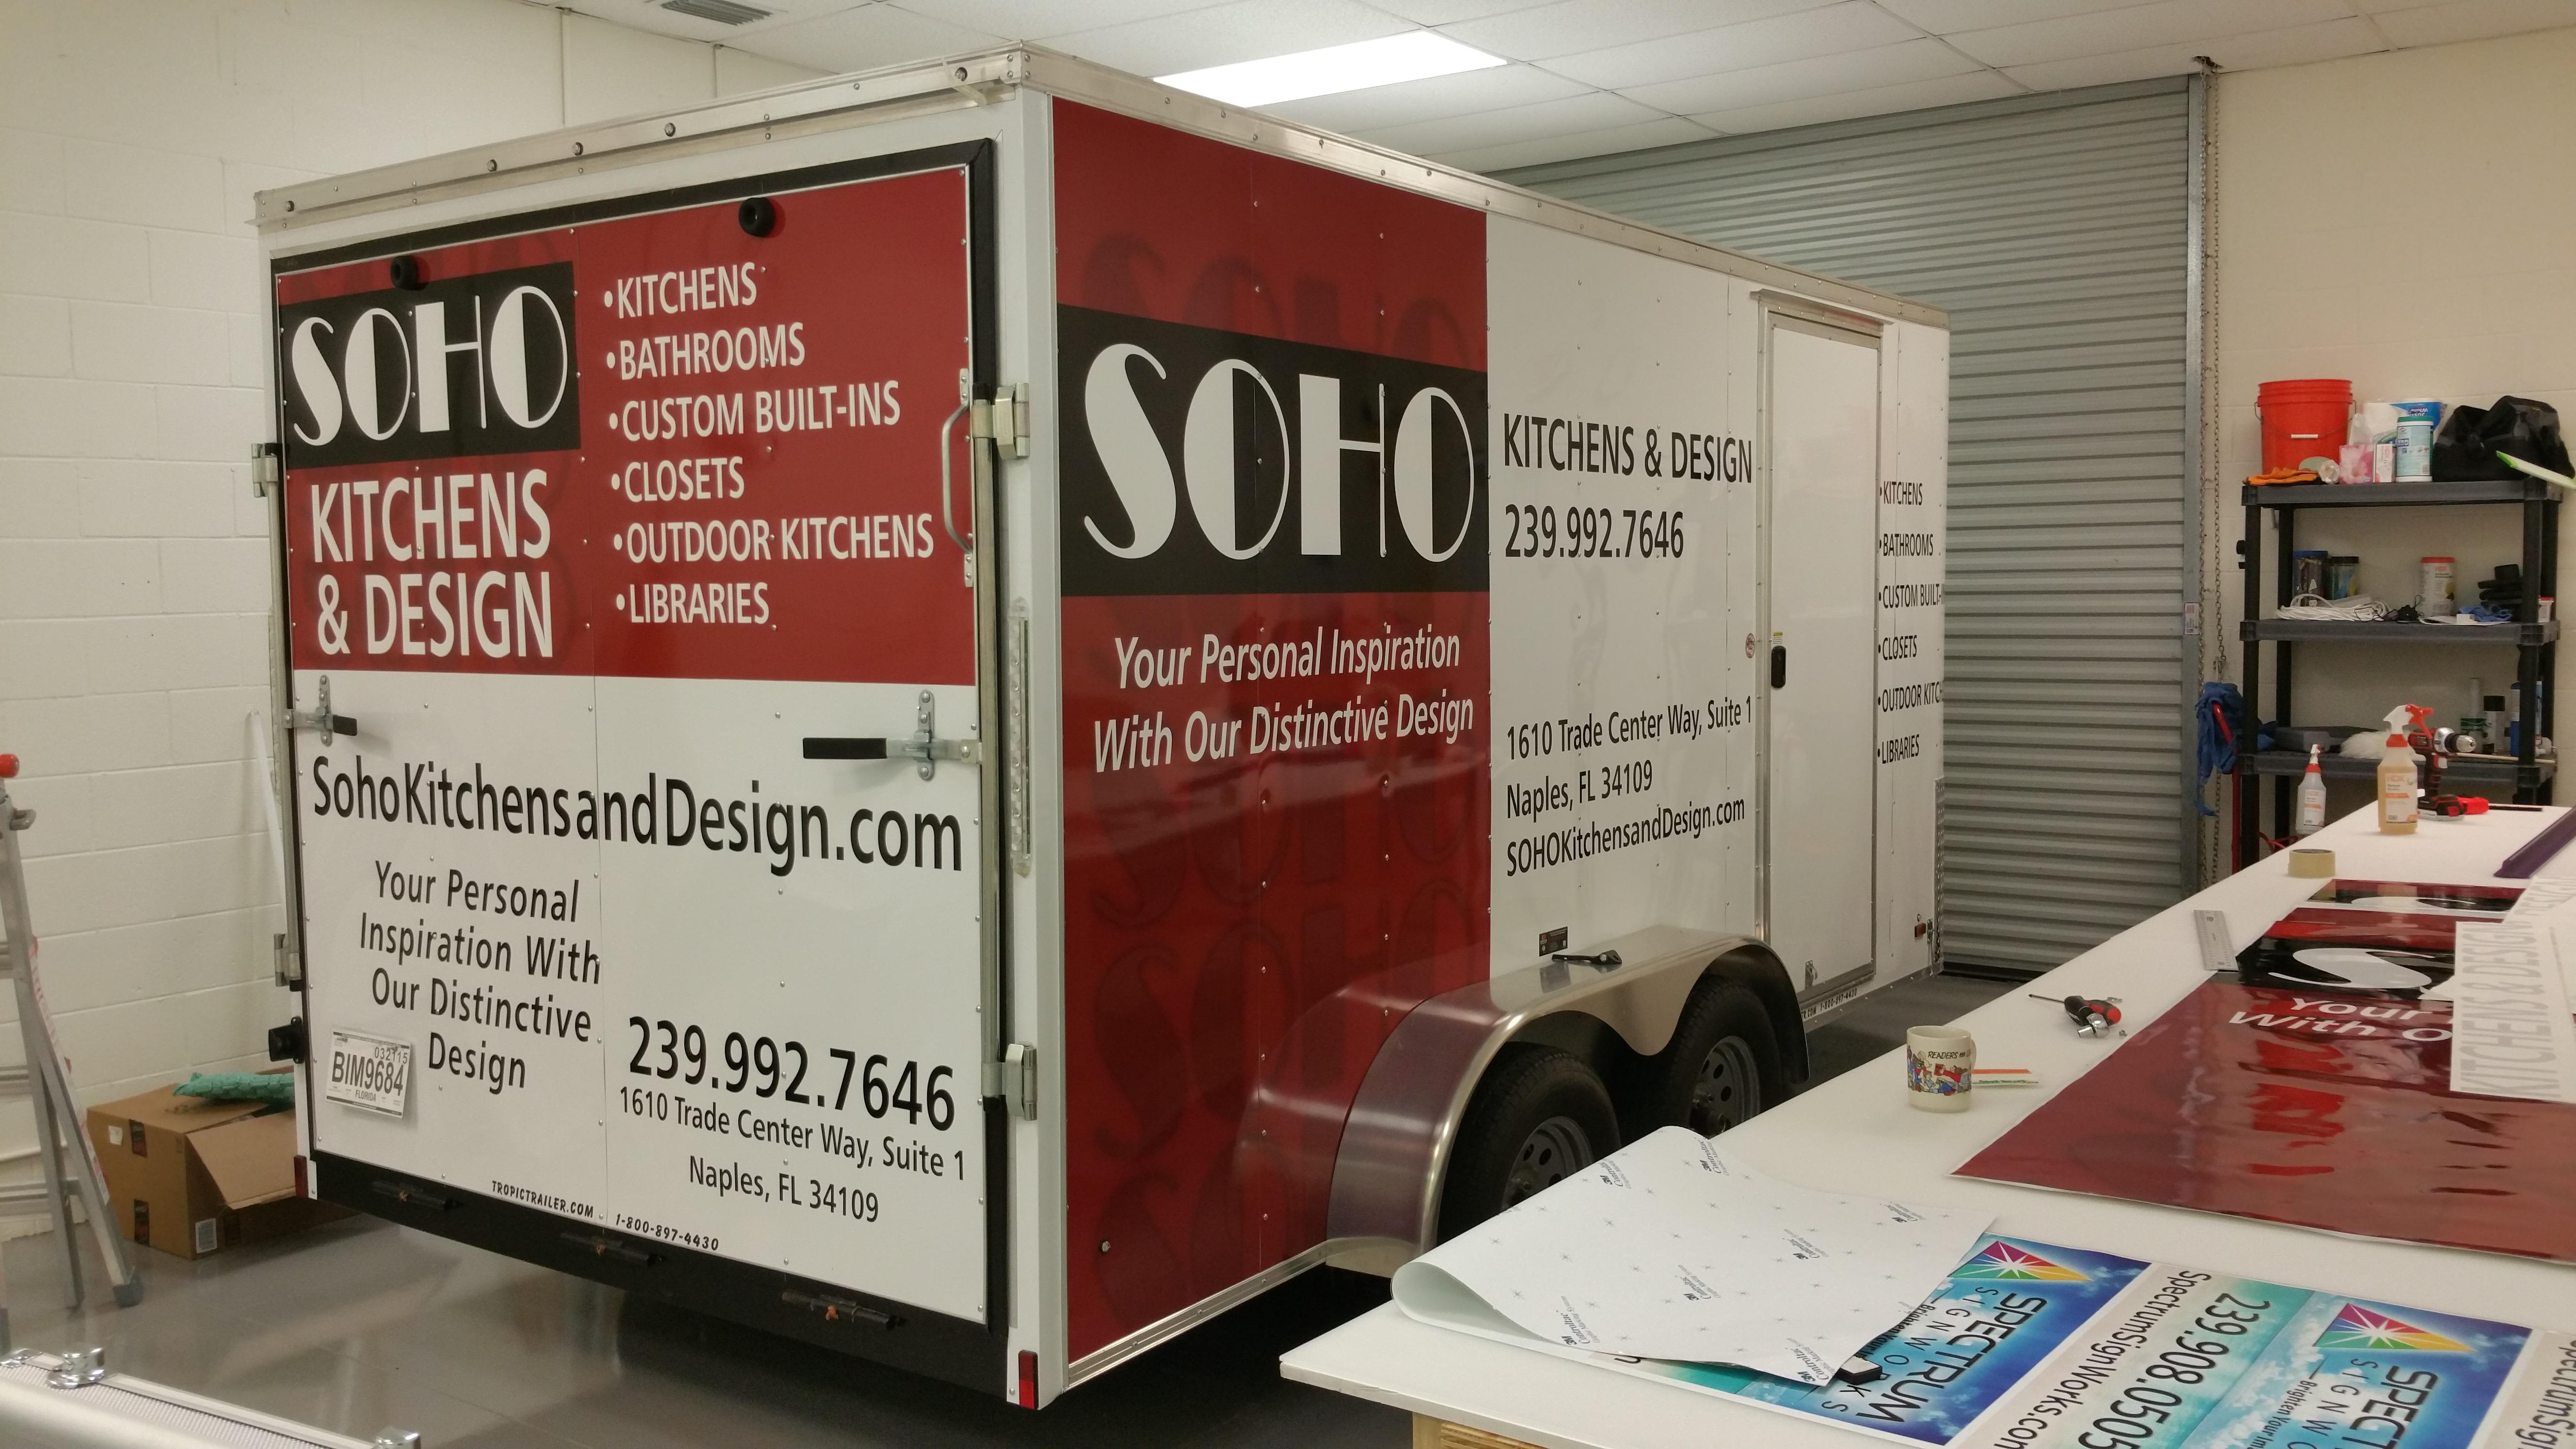 Vehicle Wrap Work Trailer In Naples Fl For Soho